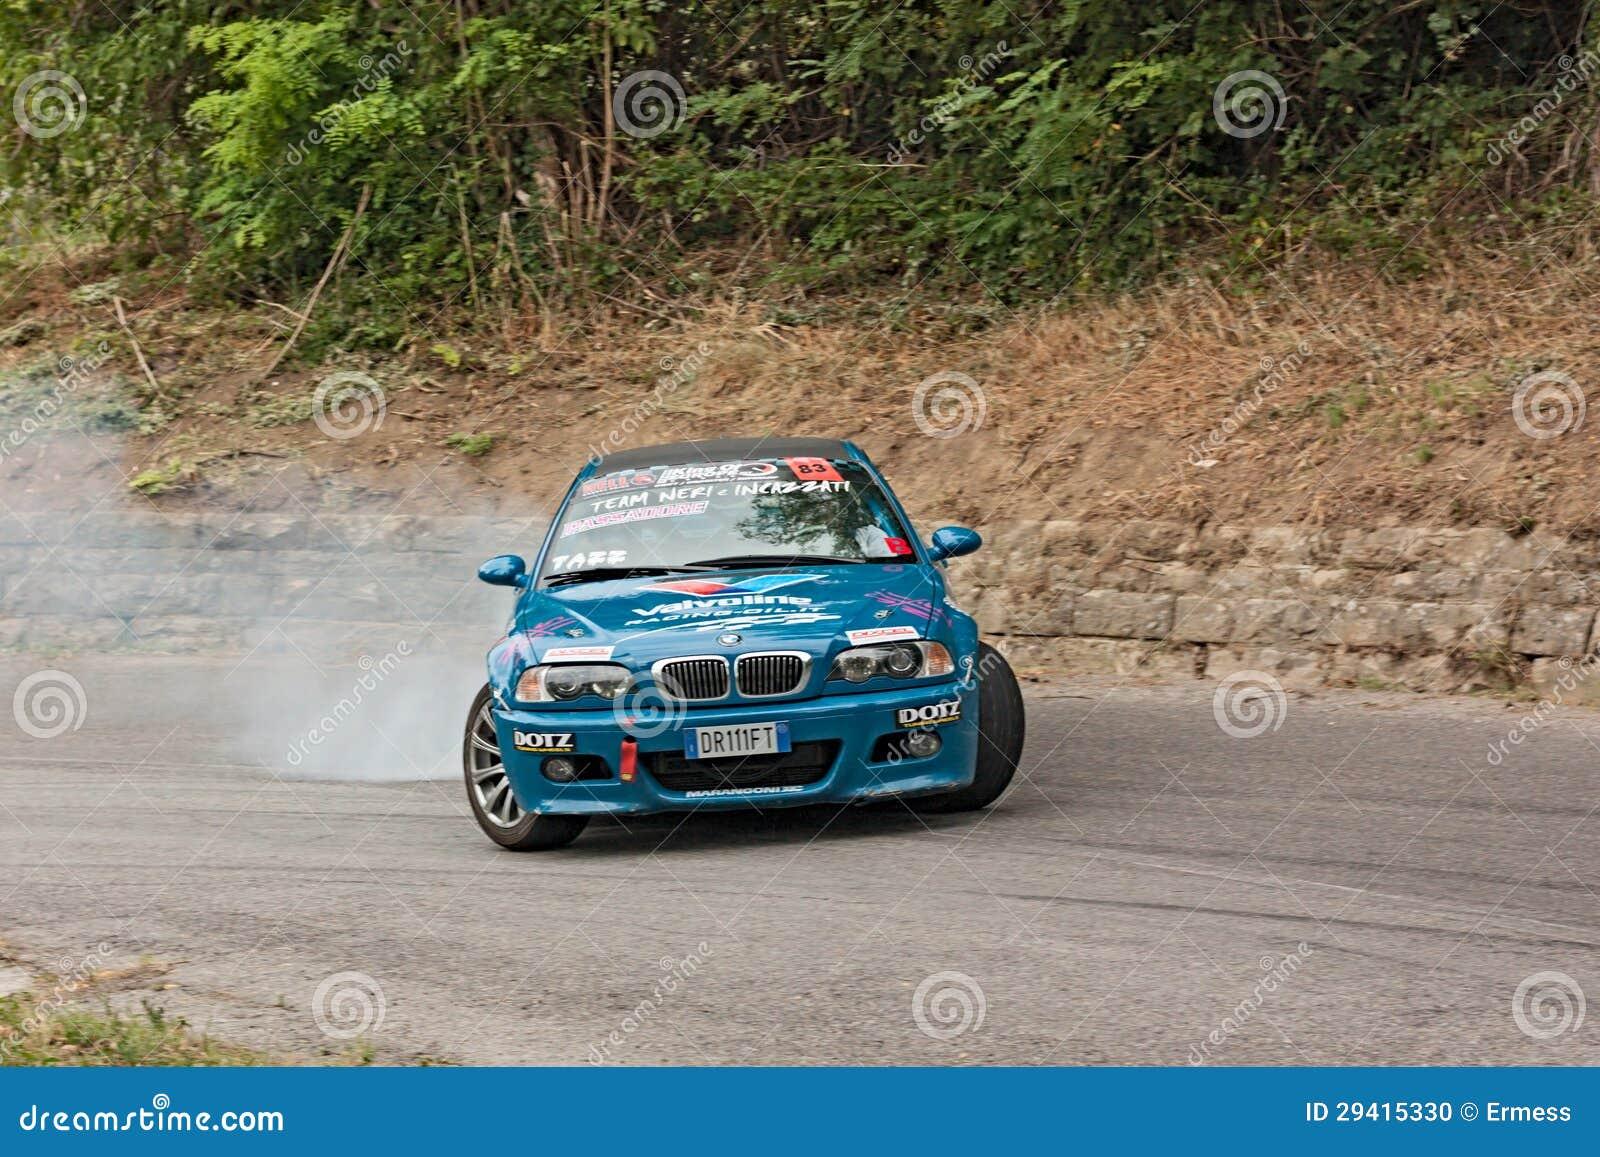 Drift racing car